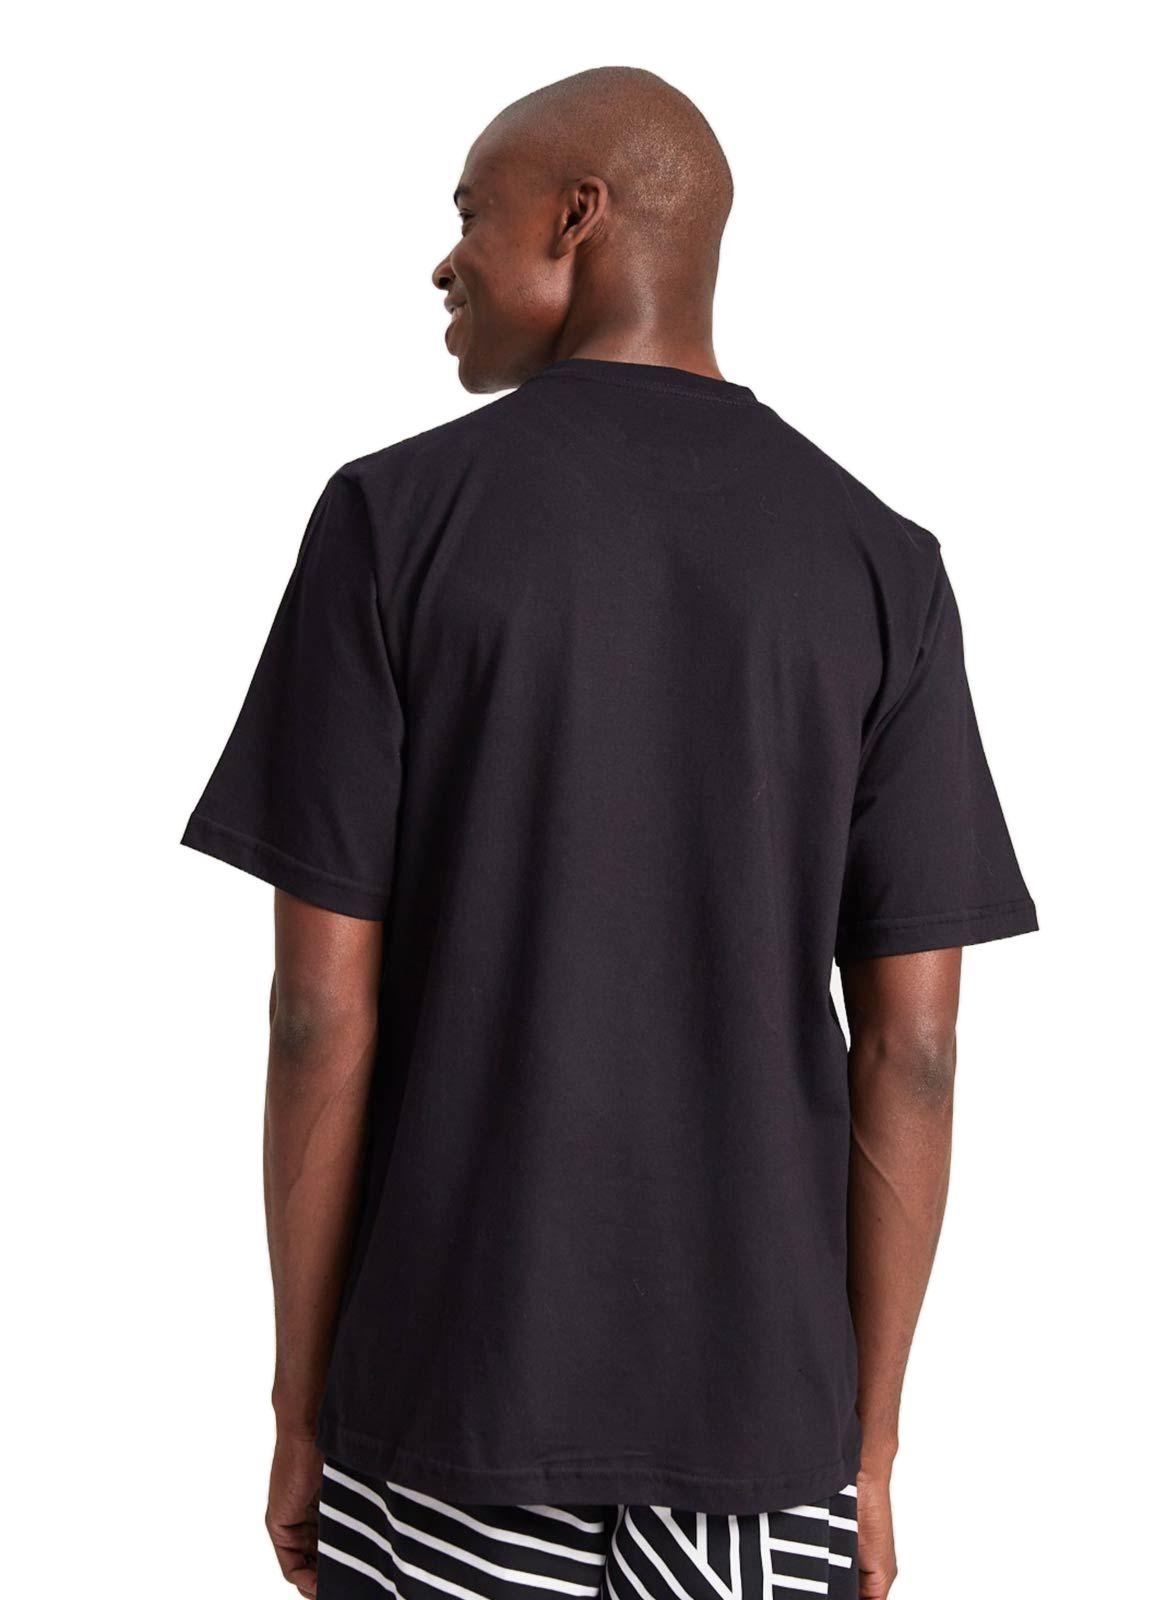 Camiseta Básica Lab Listras Preta